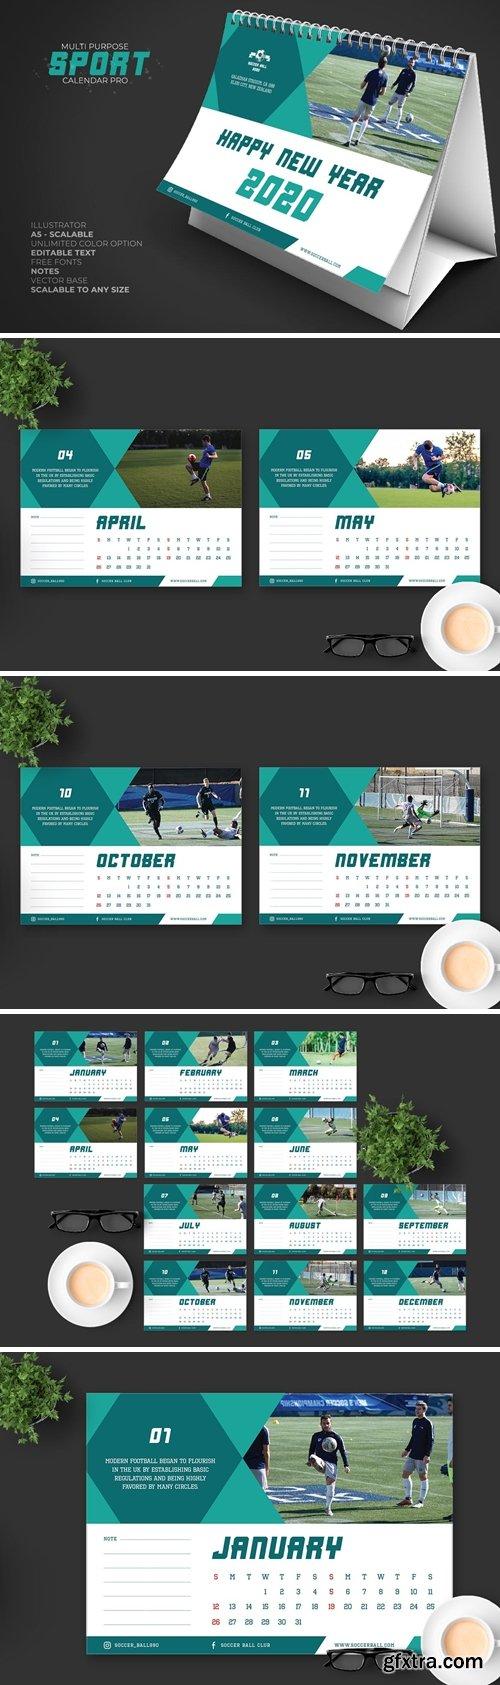 2020 Sport Calendar Desk Pro